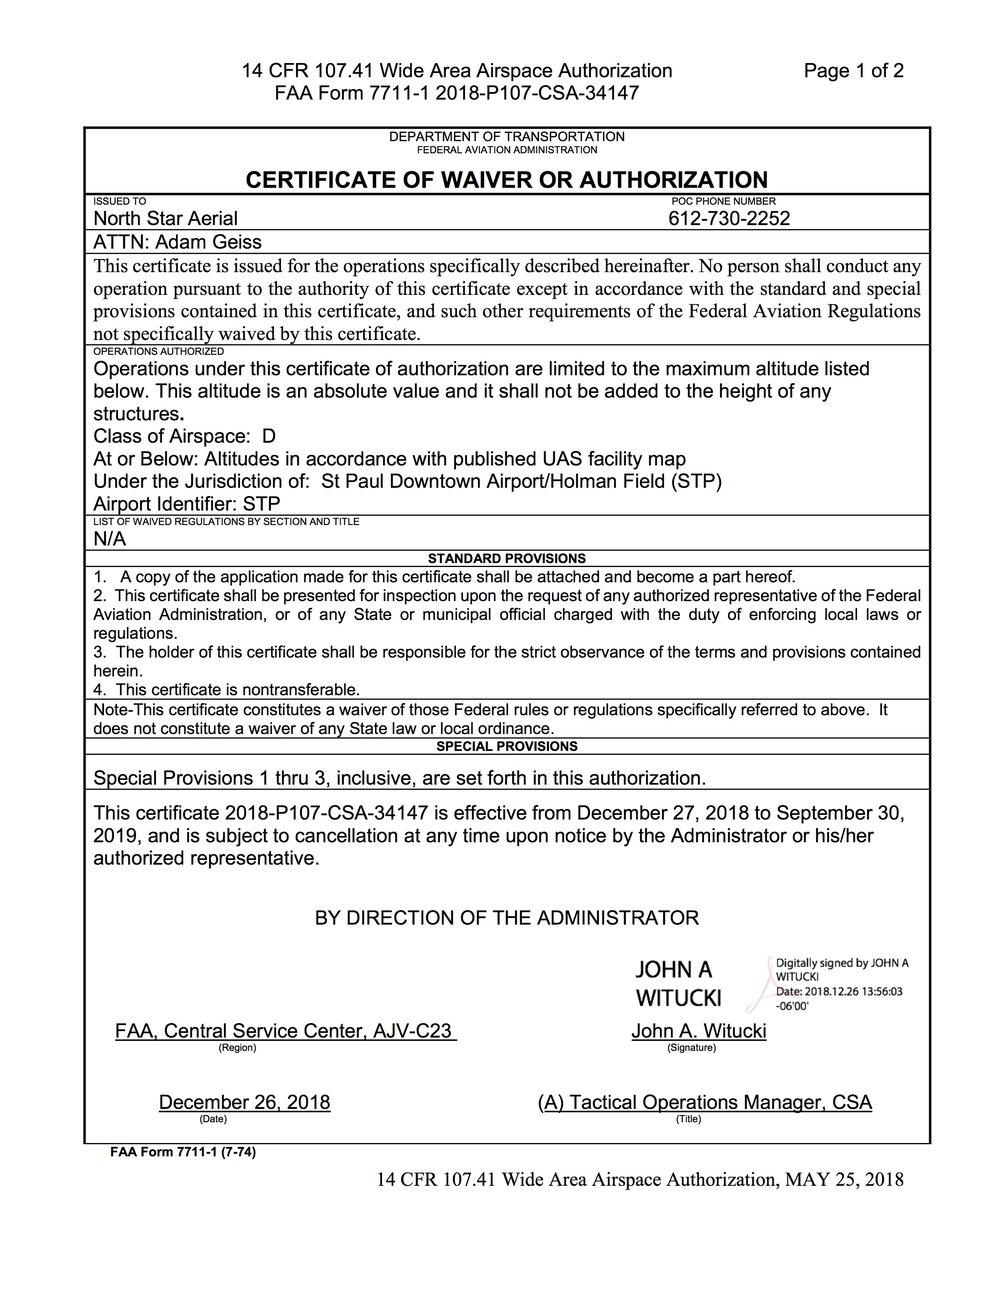 FAA Form 7711-1 2018-P107-CSA-34147 STP.jpg